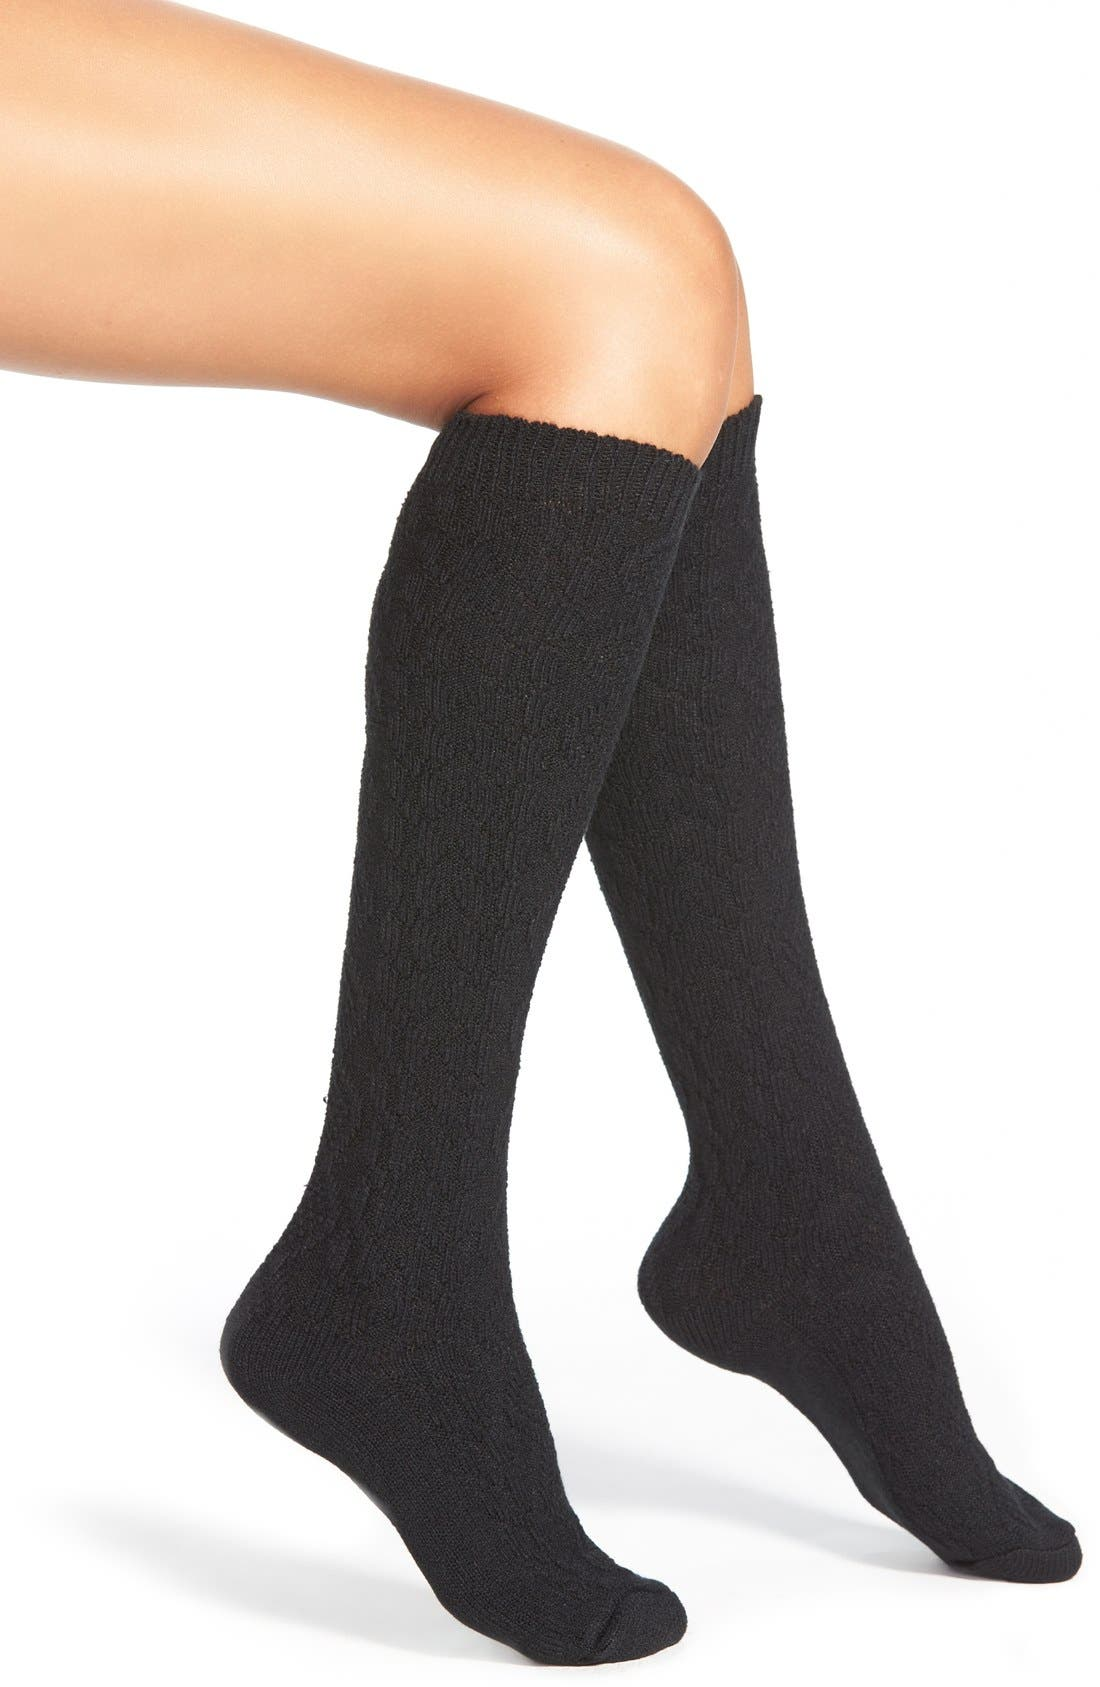 Main Image - Hue 'Fisherman' Cable Knit Knee High Socks